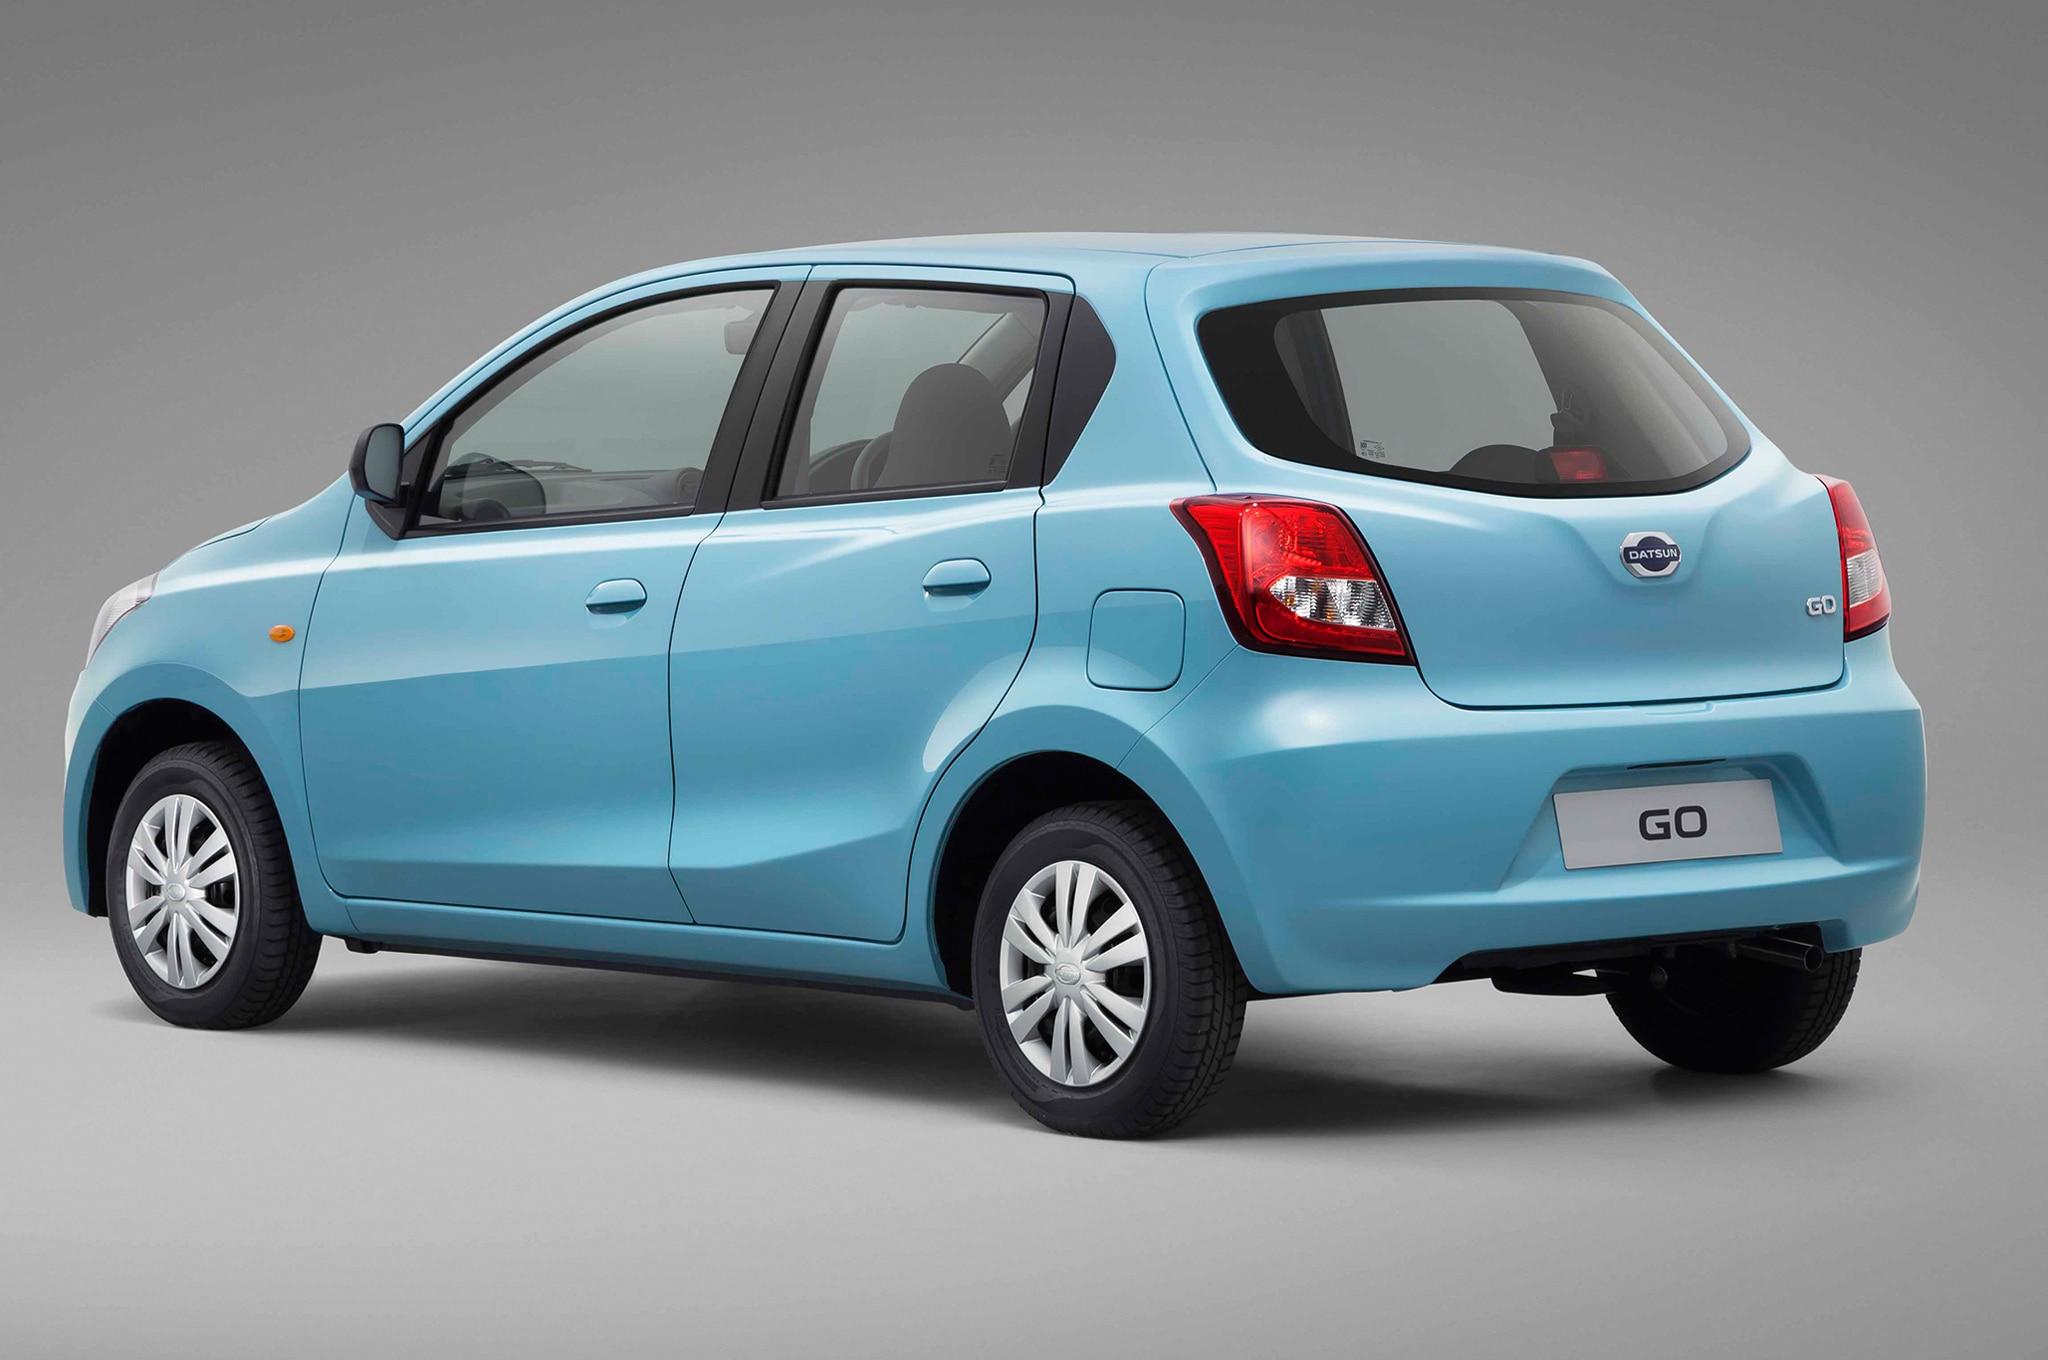 Datsun Go Revealed For Indian Market